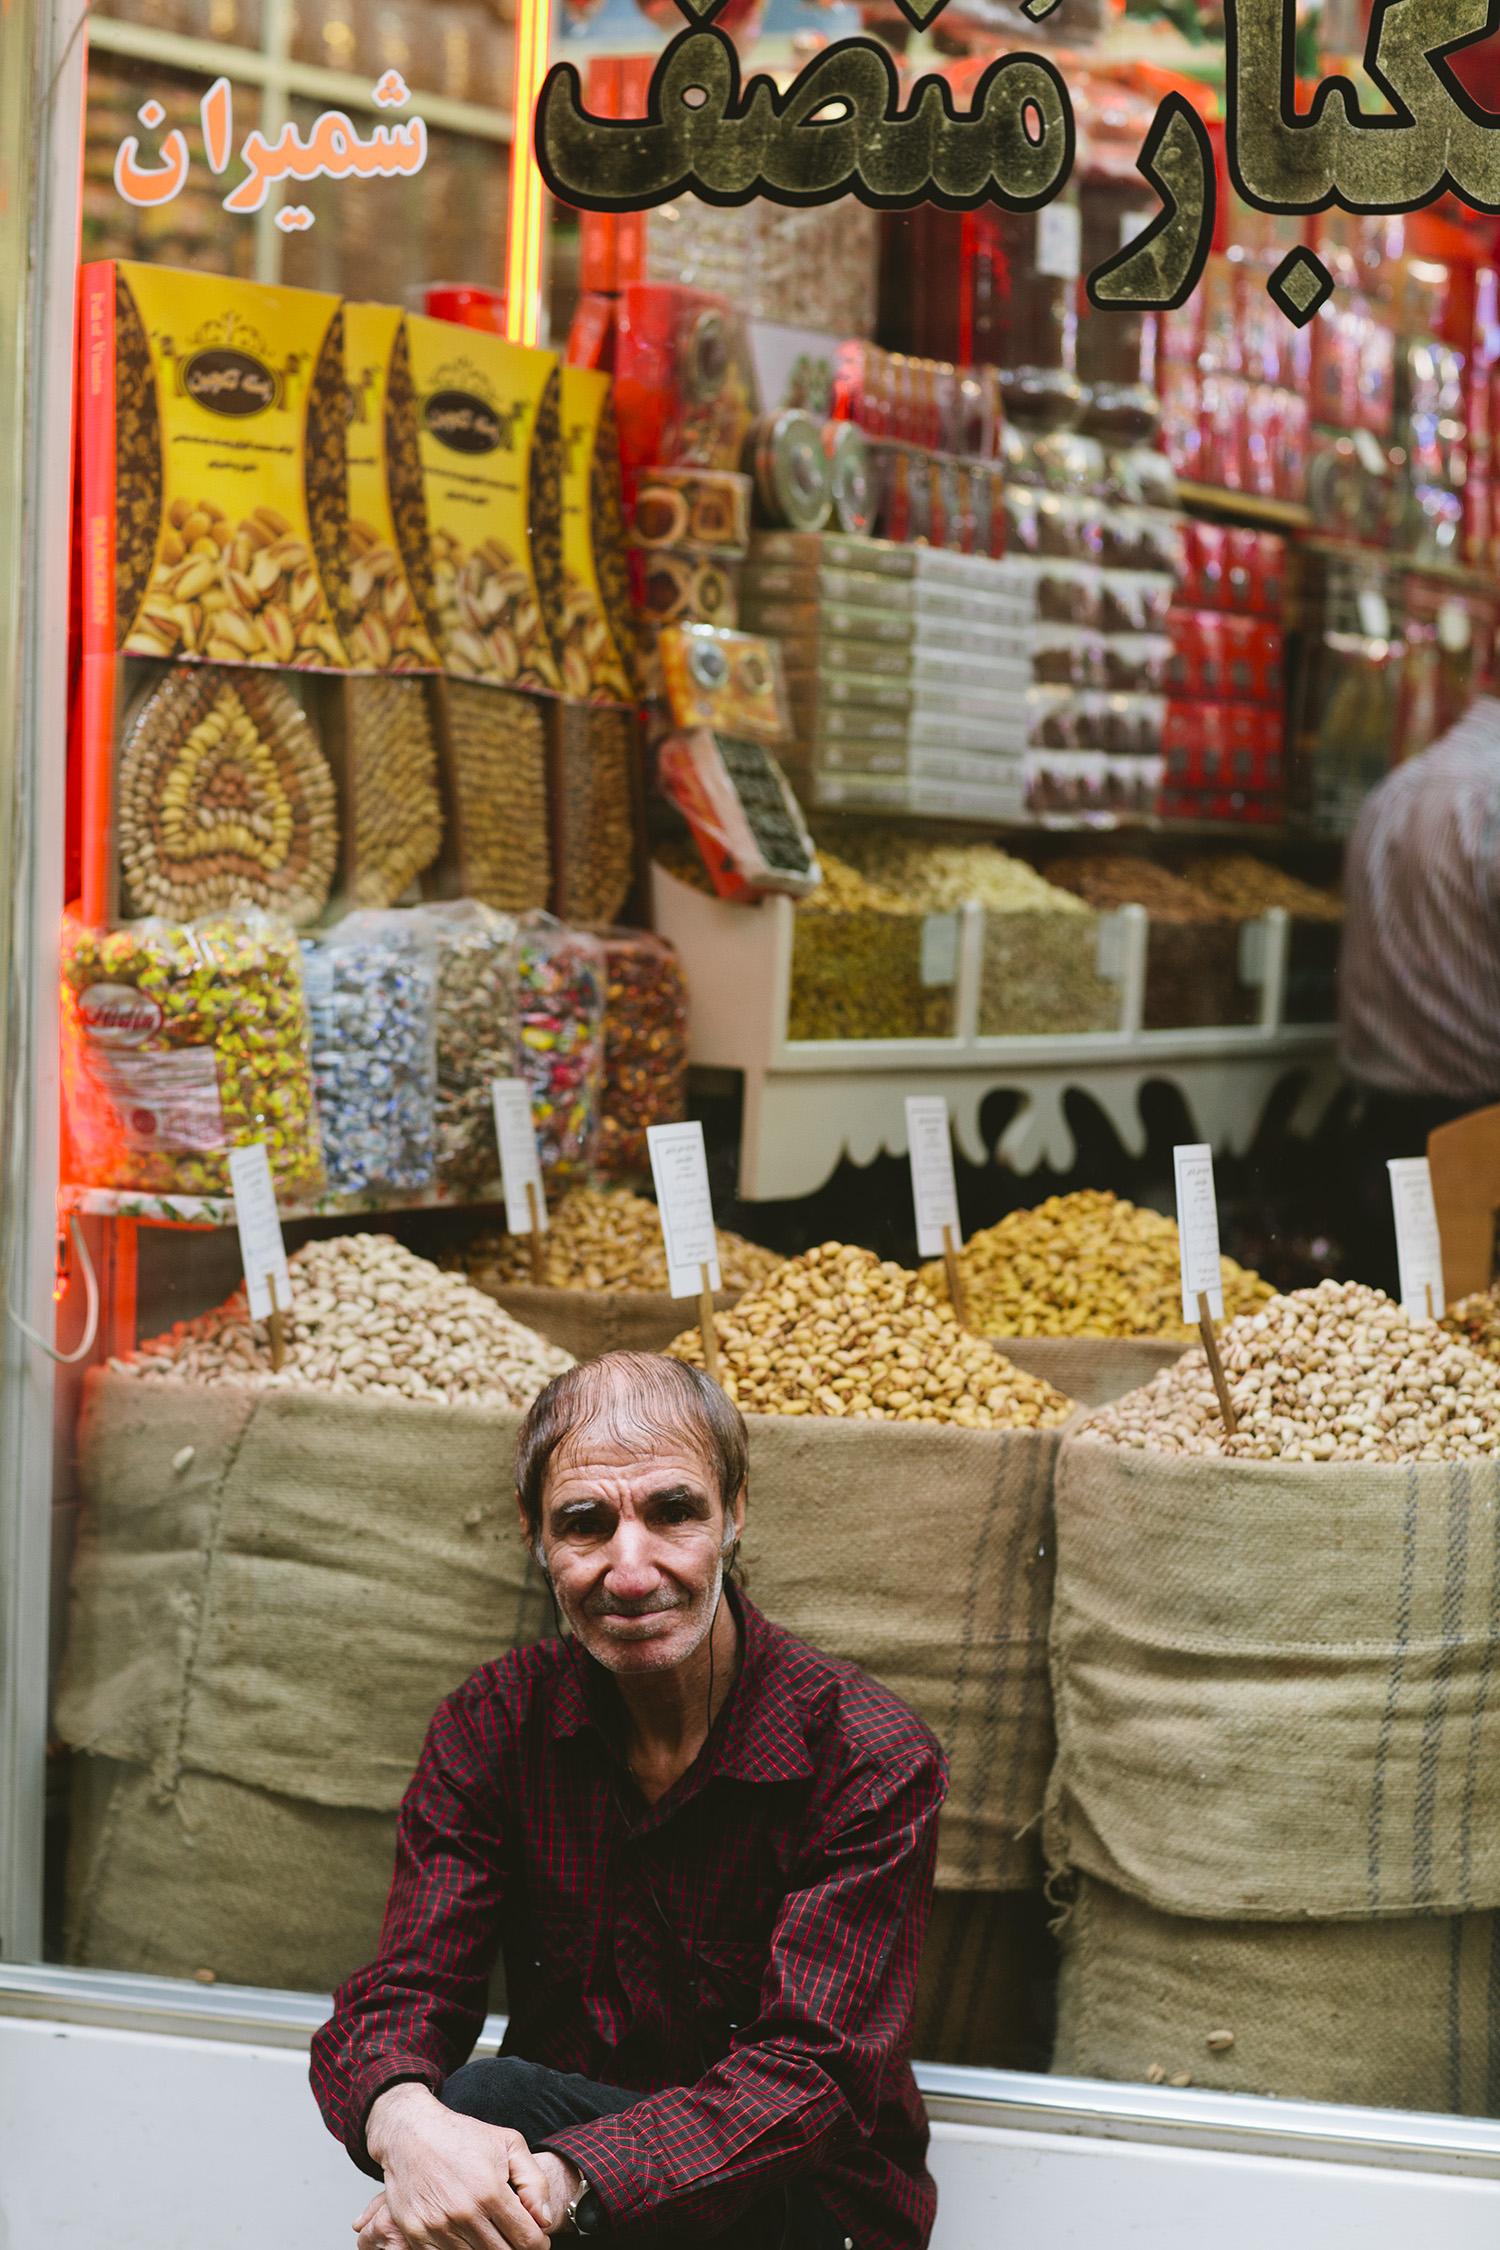 lifestyle-editorial-travel-washington-dc-malek-naz-photography-old-man-tehran-bazaar.jpg